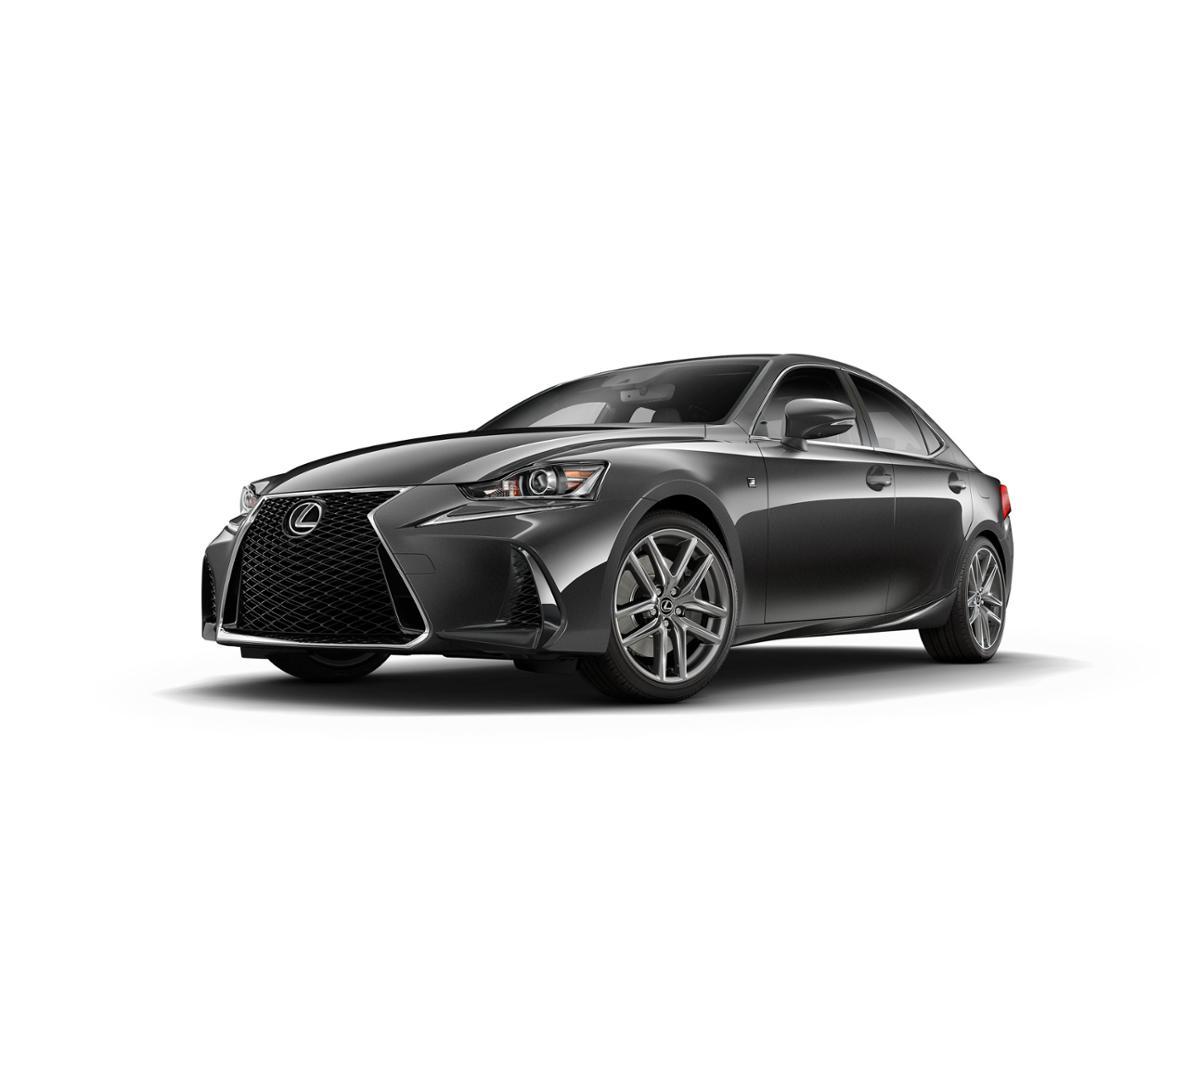 2018 Lexus IS 300 Vehicle Photo in Henderson, NV 89011